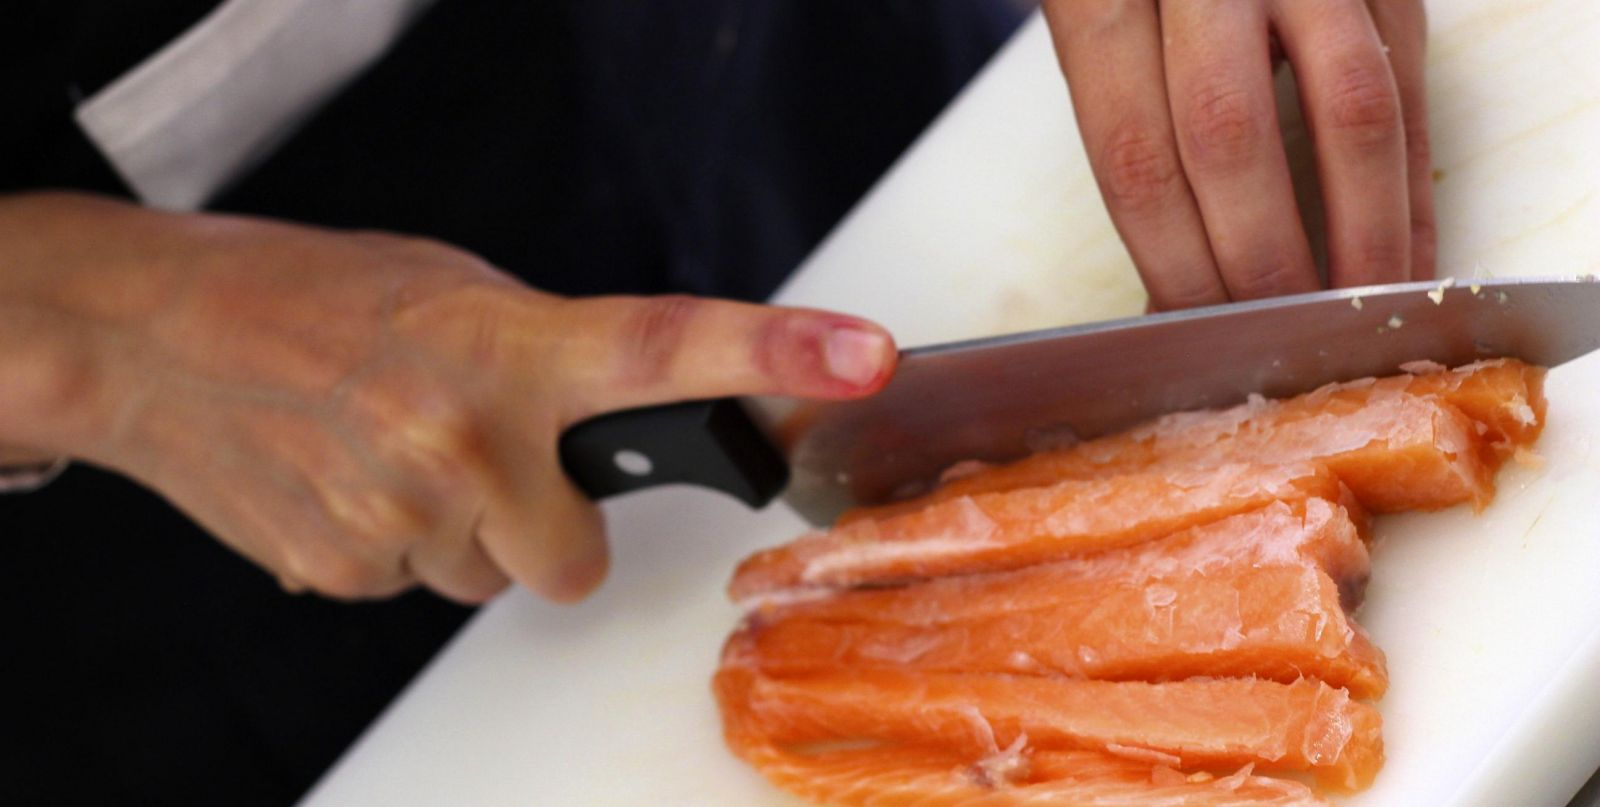 Clases para inexpertos y no iniciados cocina f cil para for Tecnicas modernas de cocina